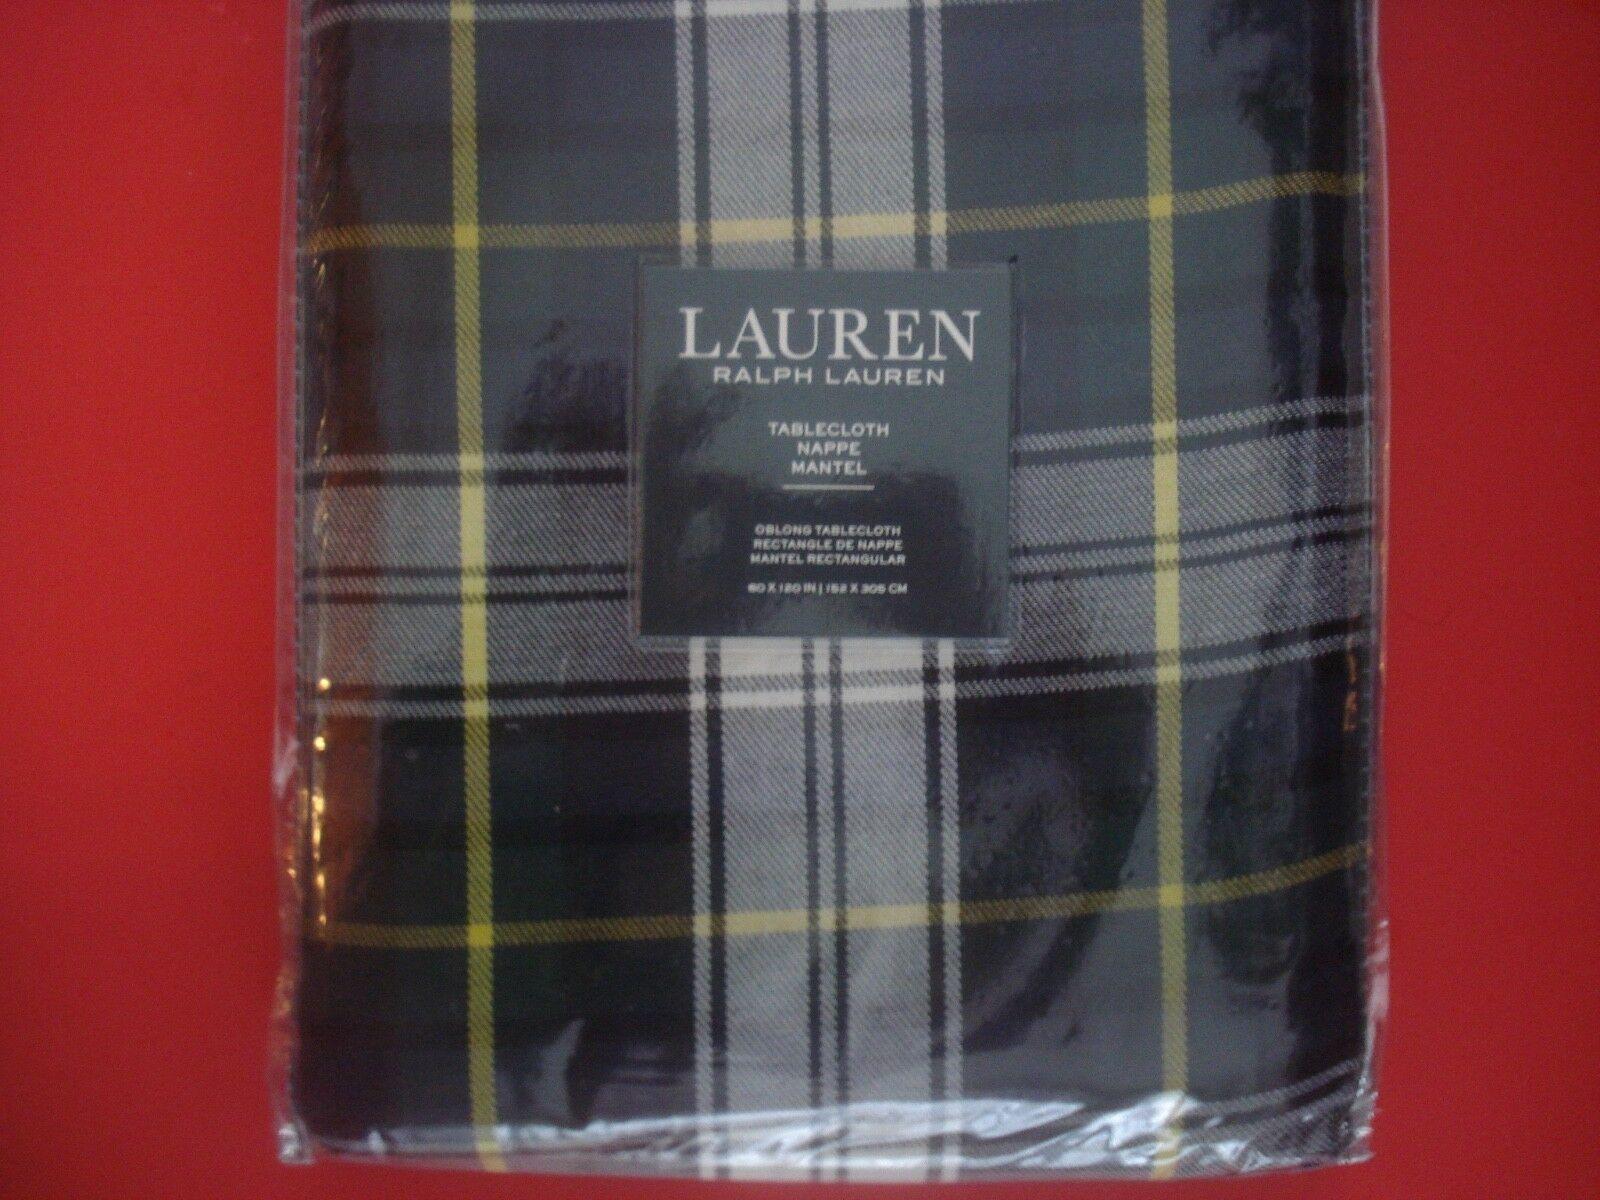 Ralph Lauren Holiday tableloth Middlebrook Tartan Plaid 60 x 120 NEUF